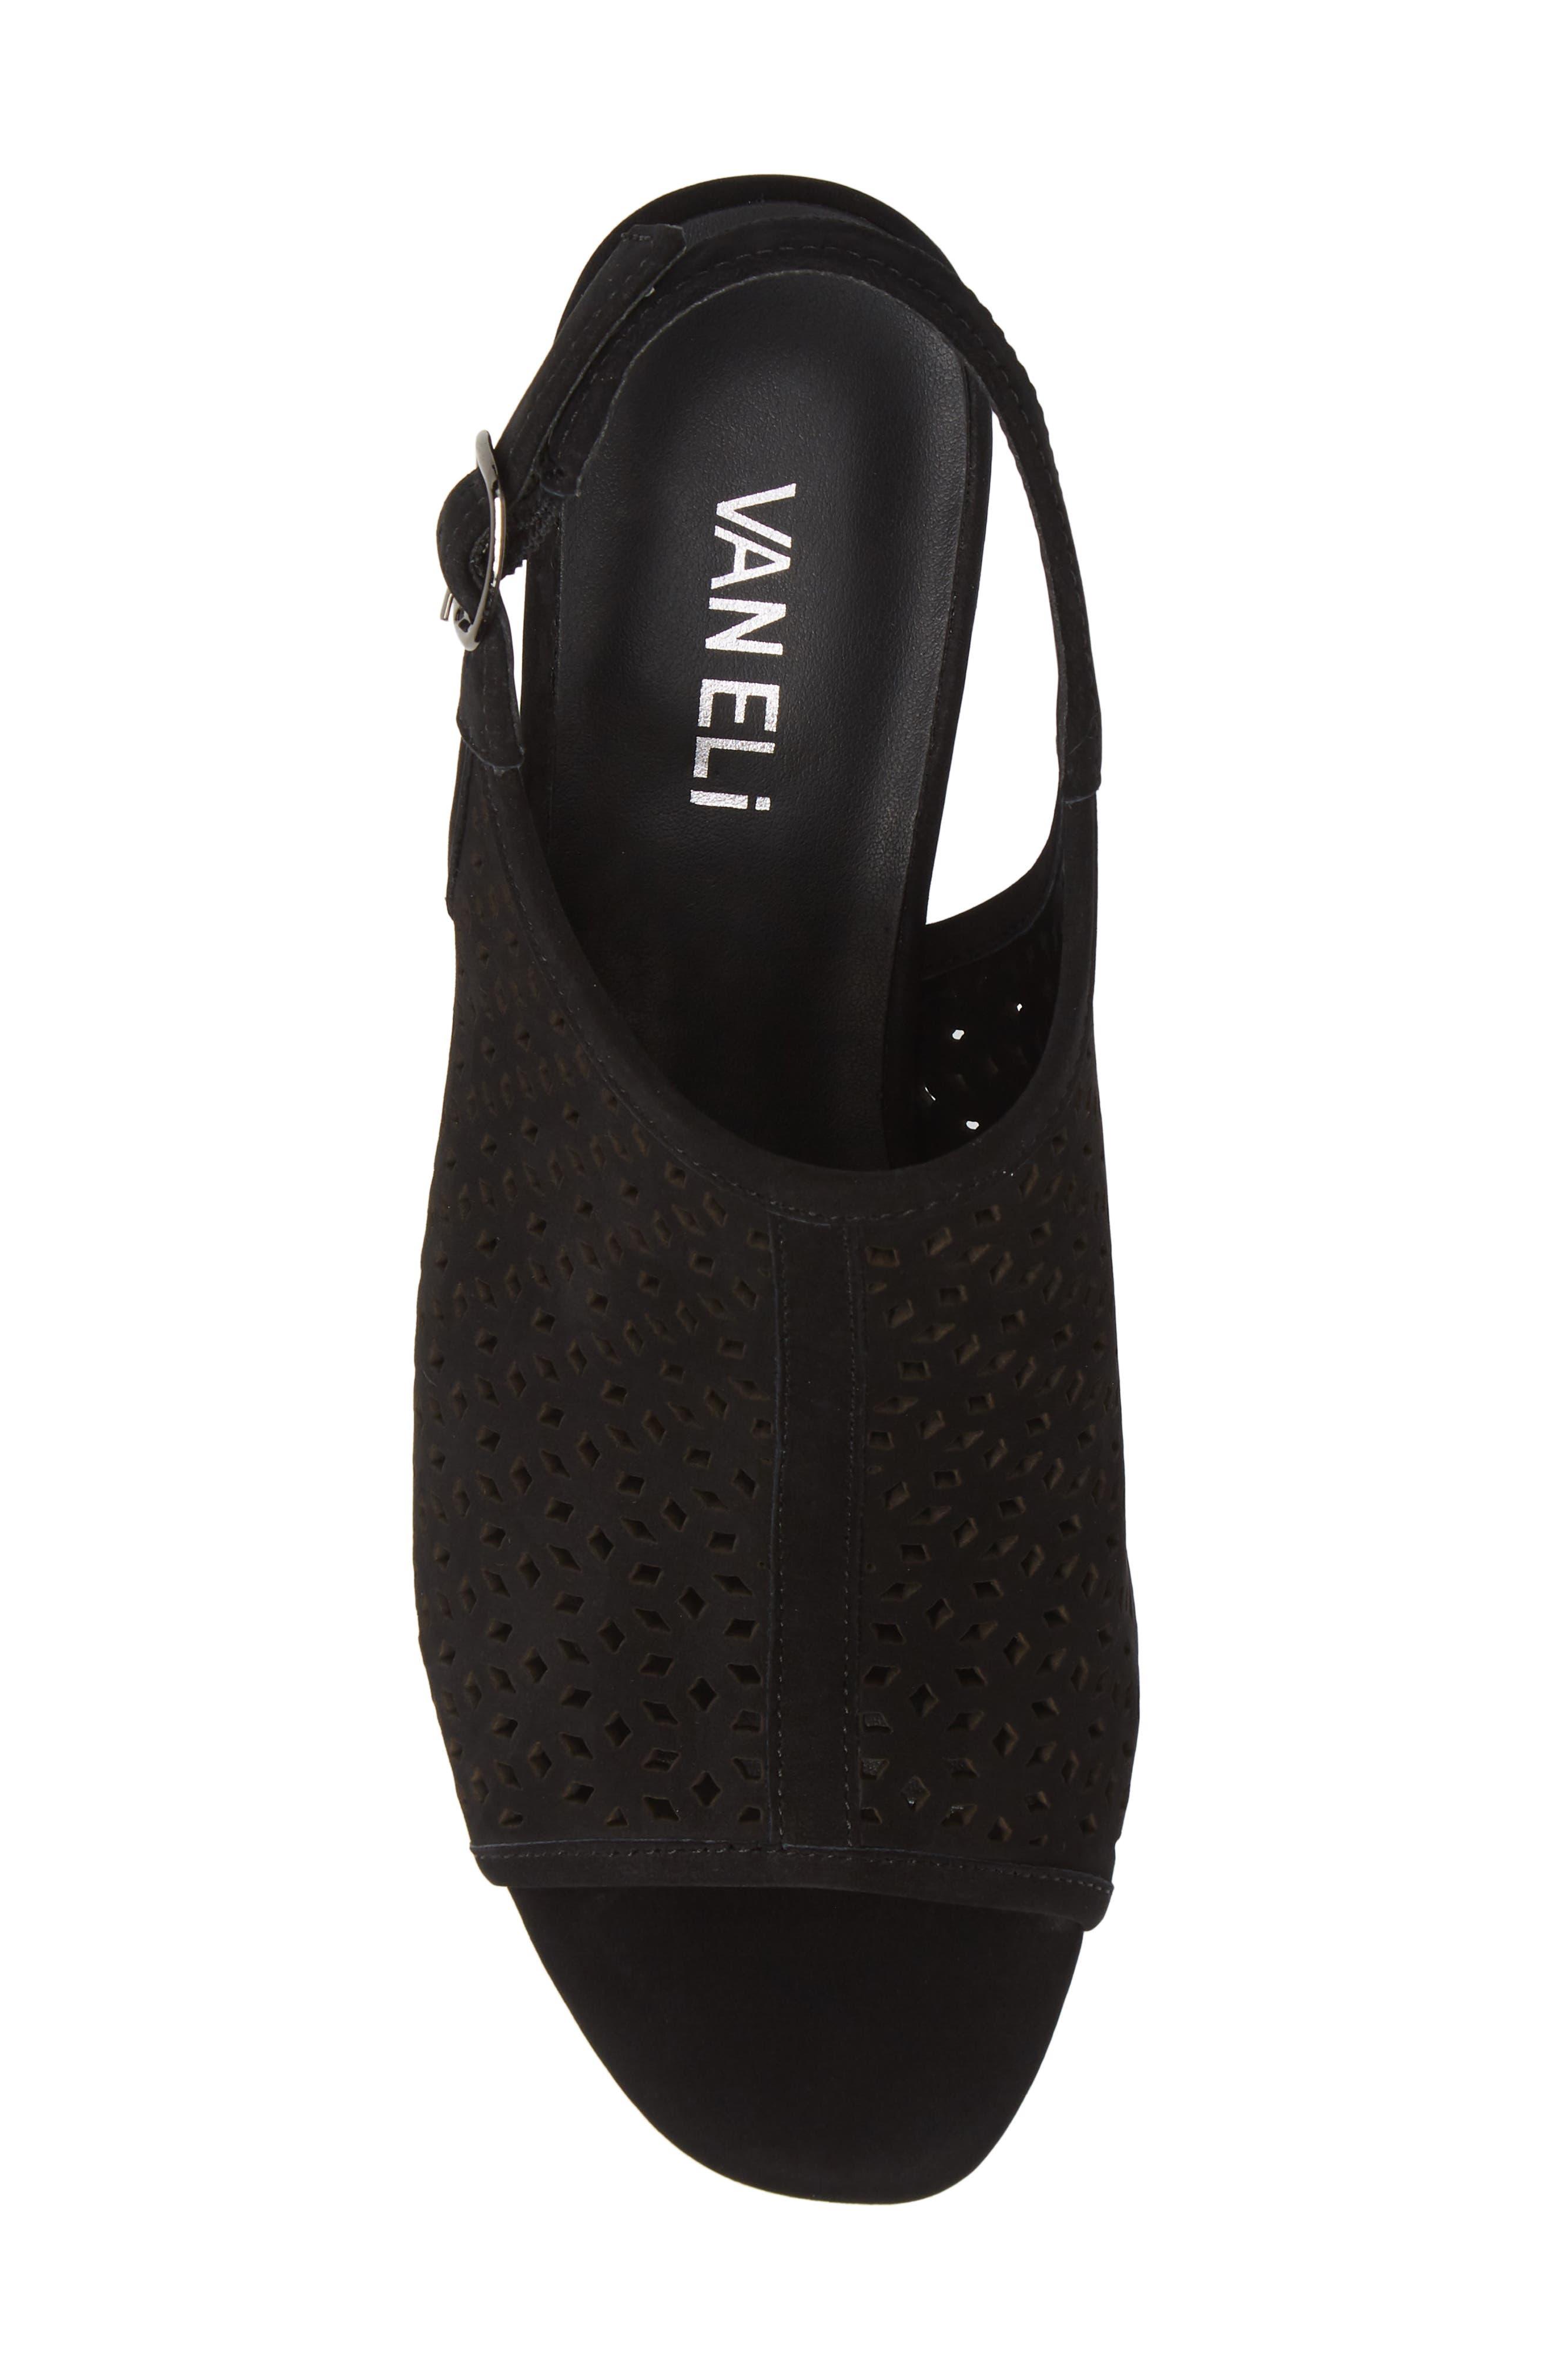 Candra Perforated Sandal,                             Alternate thumbnail 5, color,                             BLACK NUBUCK LEATHER